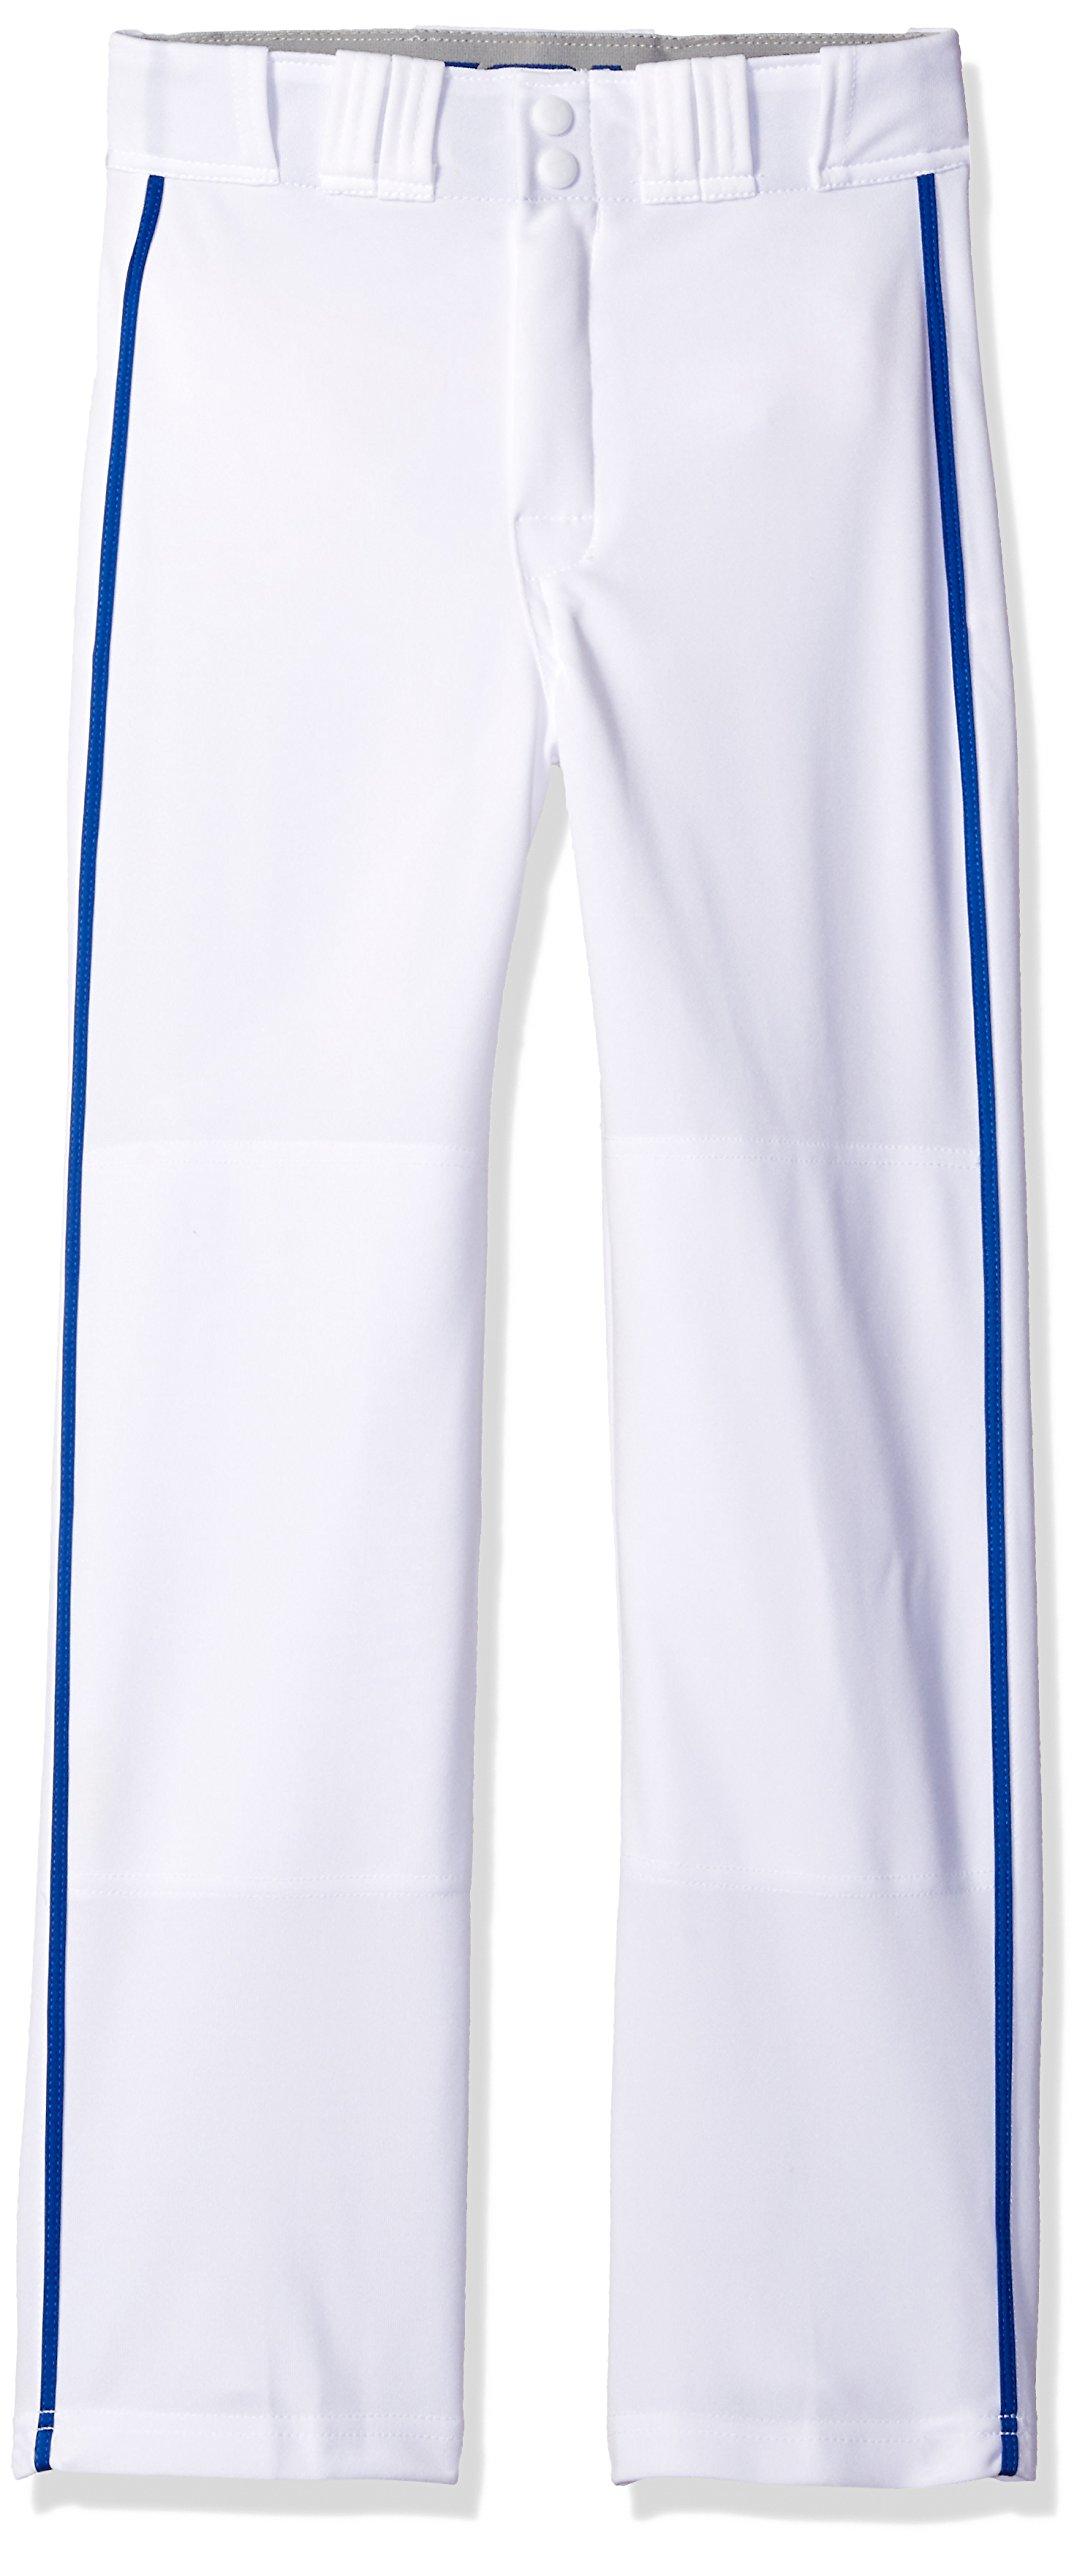 Easton Rival 2 Baseball Softball Pant | Youth | Small | White Royal | 2020 | Double Reinforced Knee | Elastic Waistband w/ 2 Color Internal Logo | 2 Batting Glove Pockets | 100% Polyester